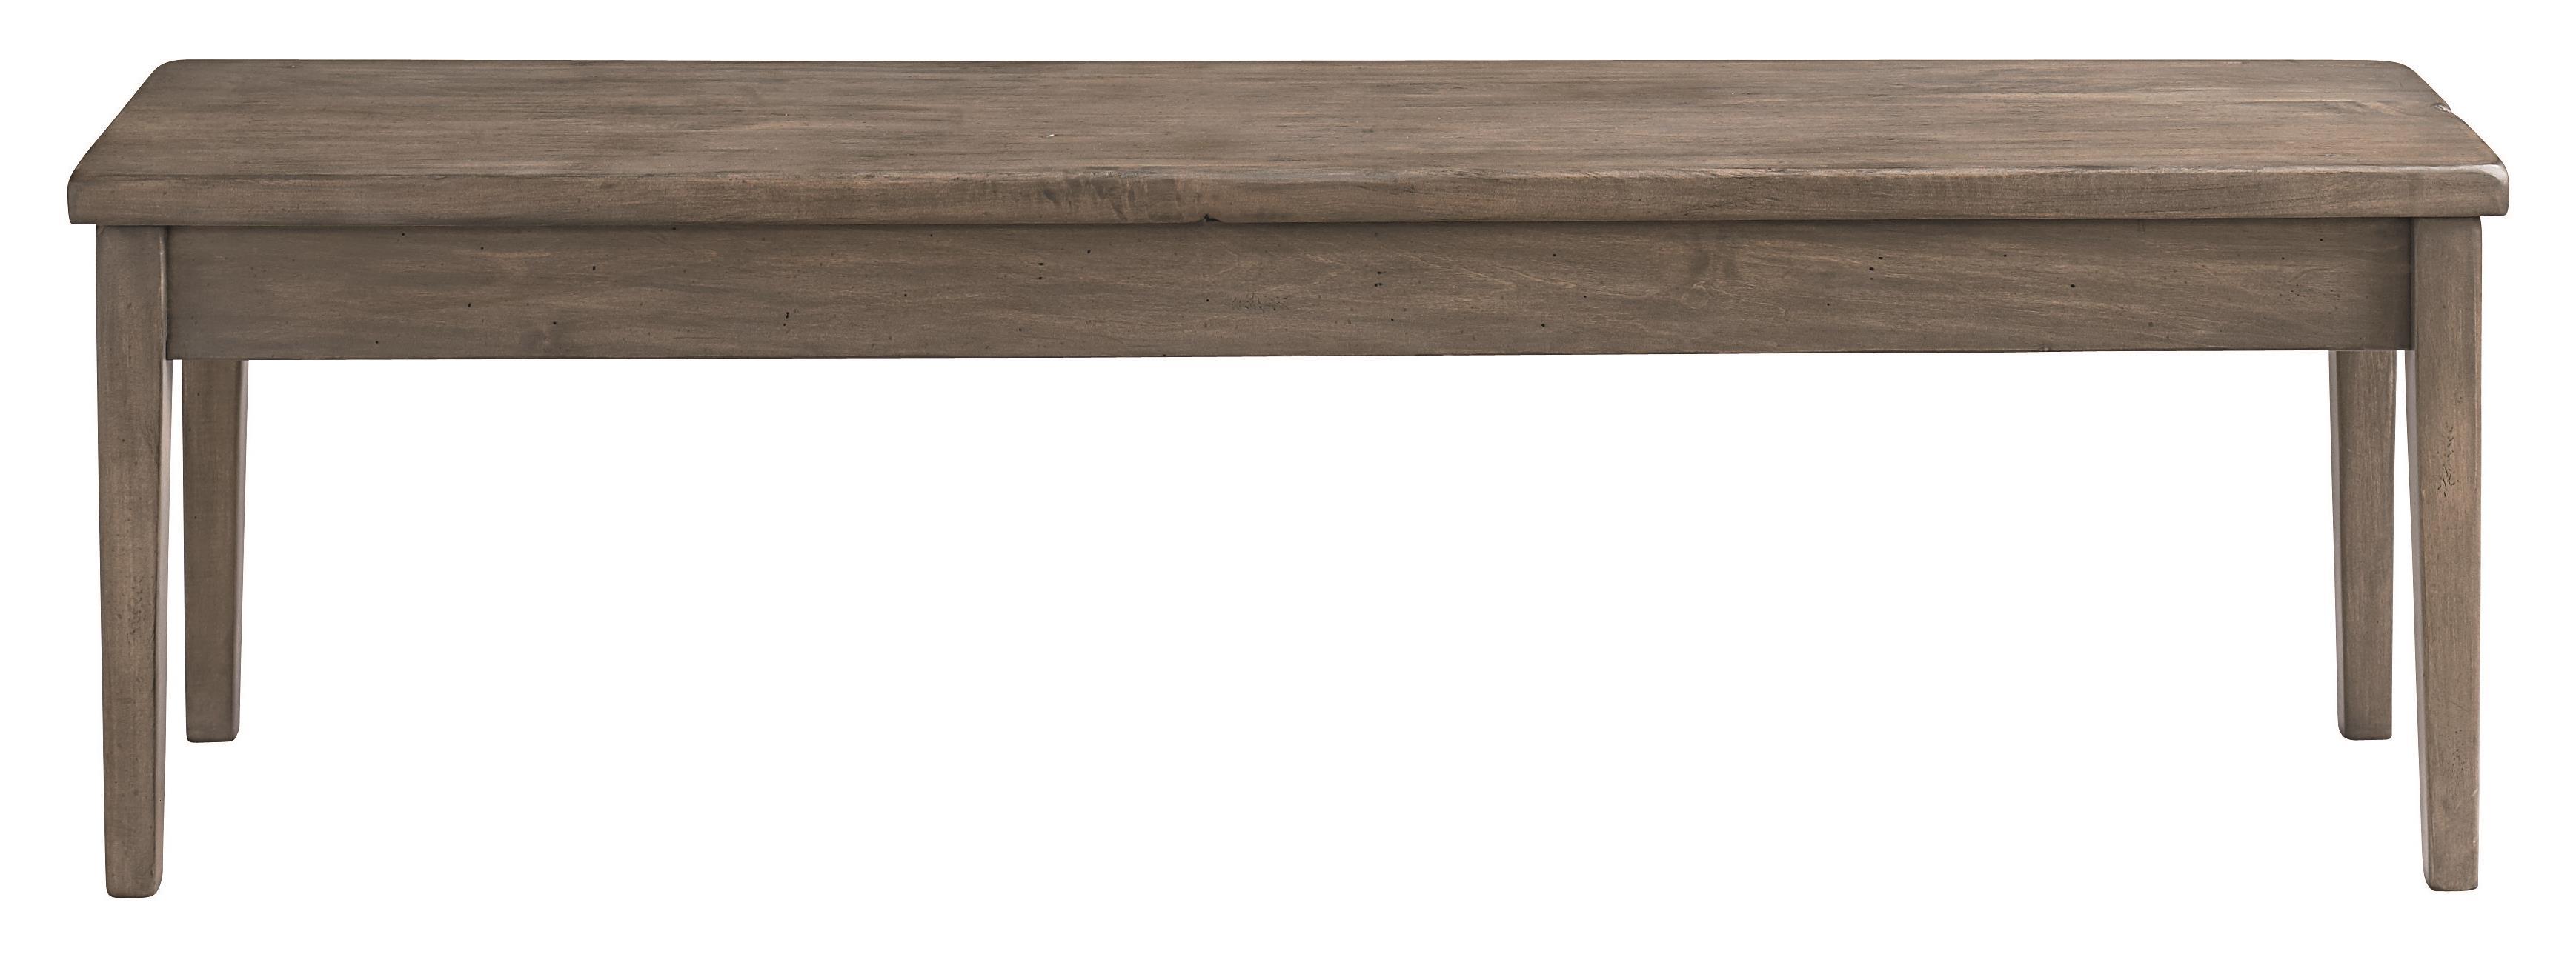 "Bench Made Maple 60"" Hearthside Bench by Bassett at Bassett of Cool Springs"